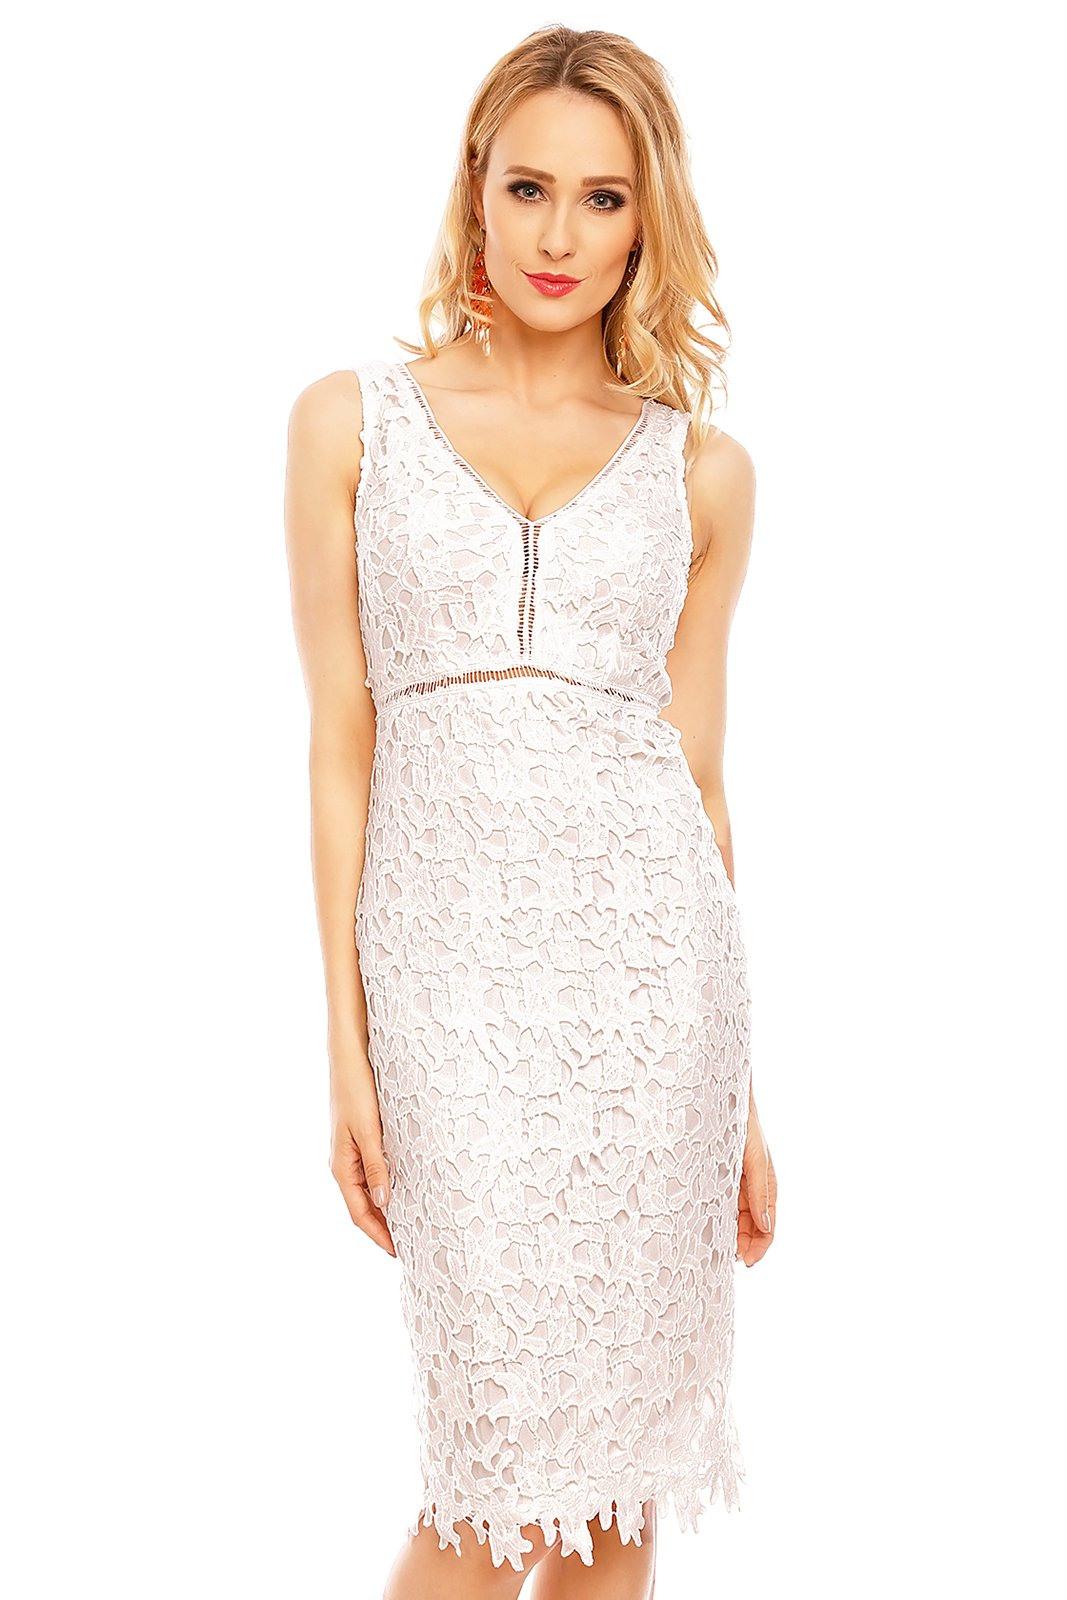 Damen Kleid Party Abendkleid Cocktailkleid Knielang Spitze